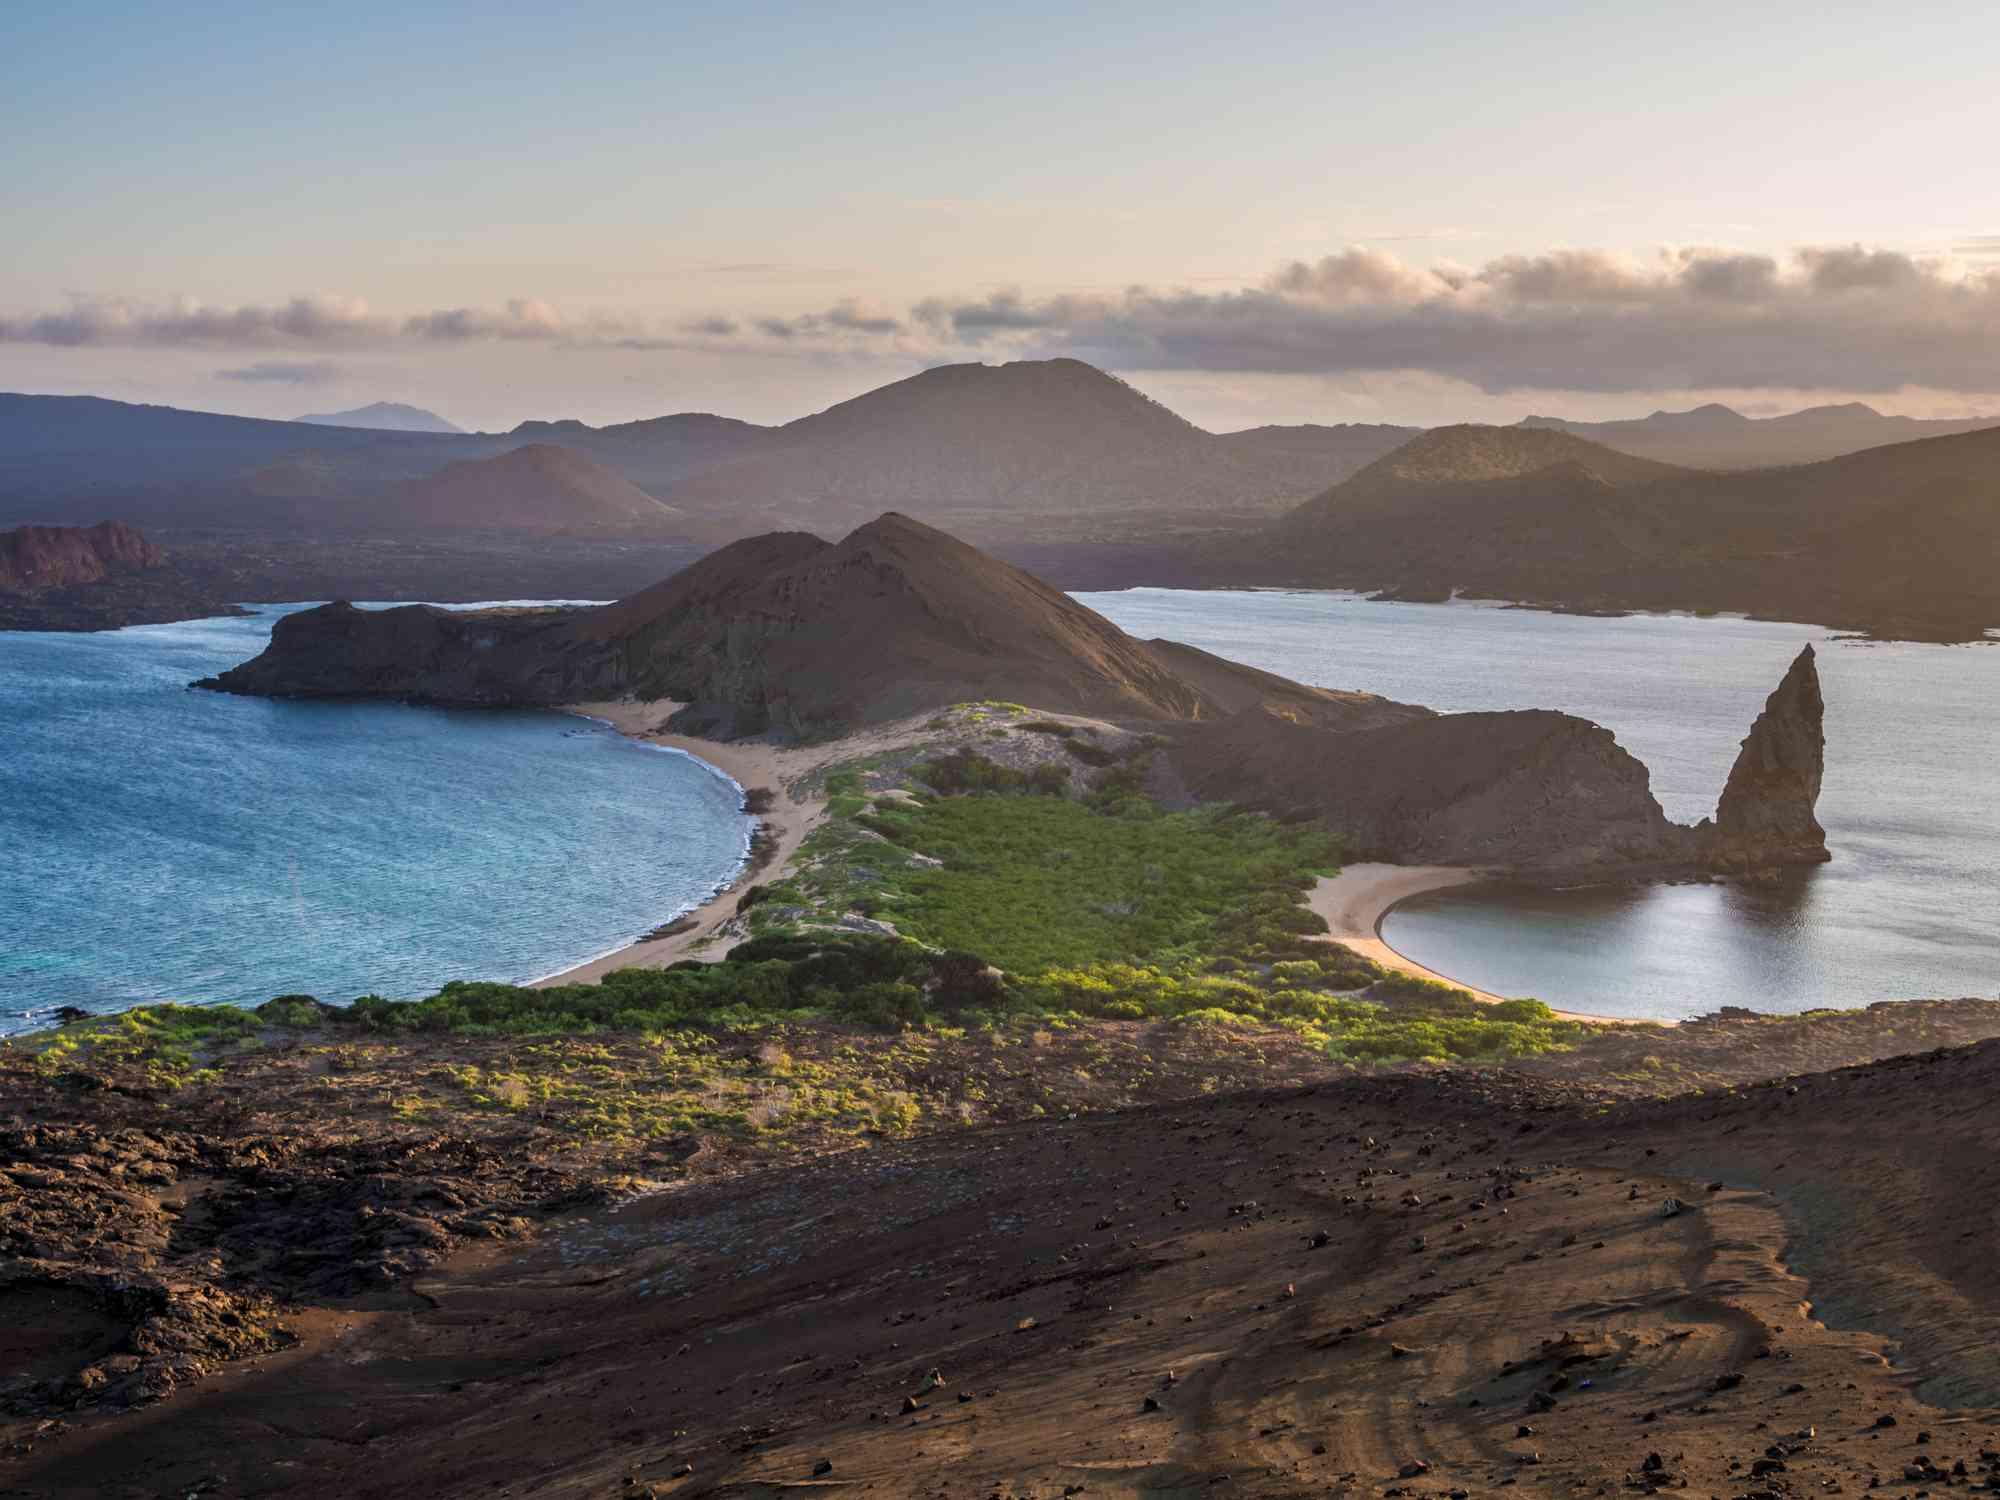 Bartolom Island in the Galapagos